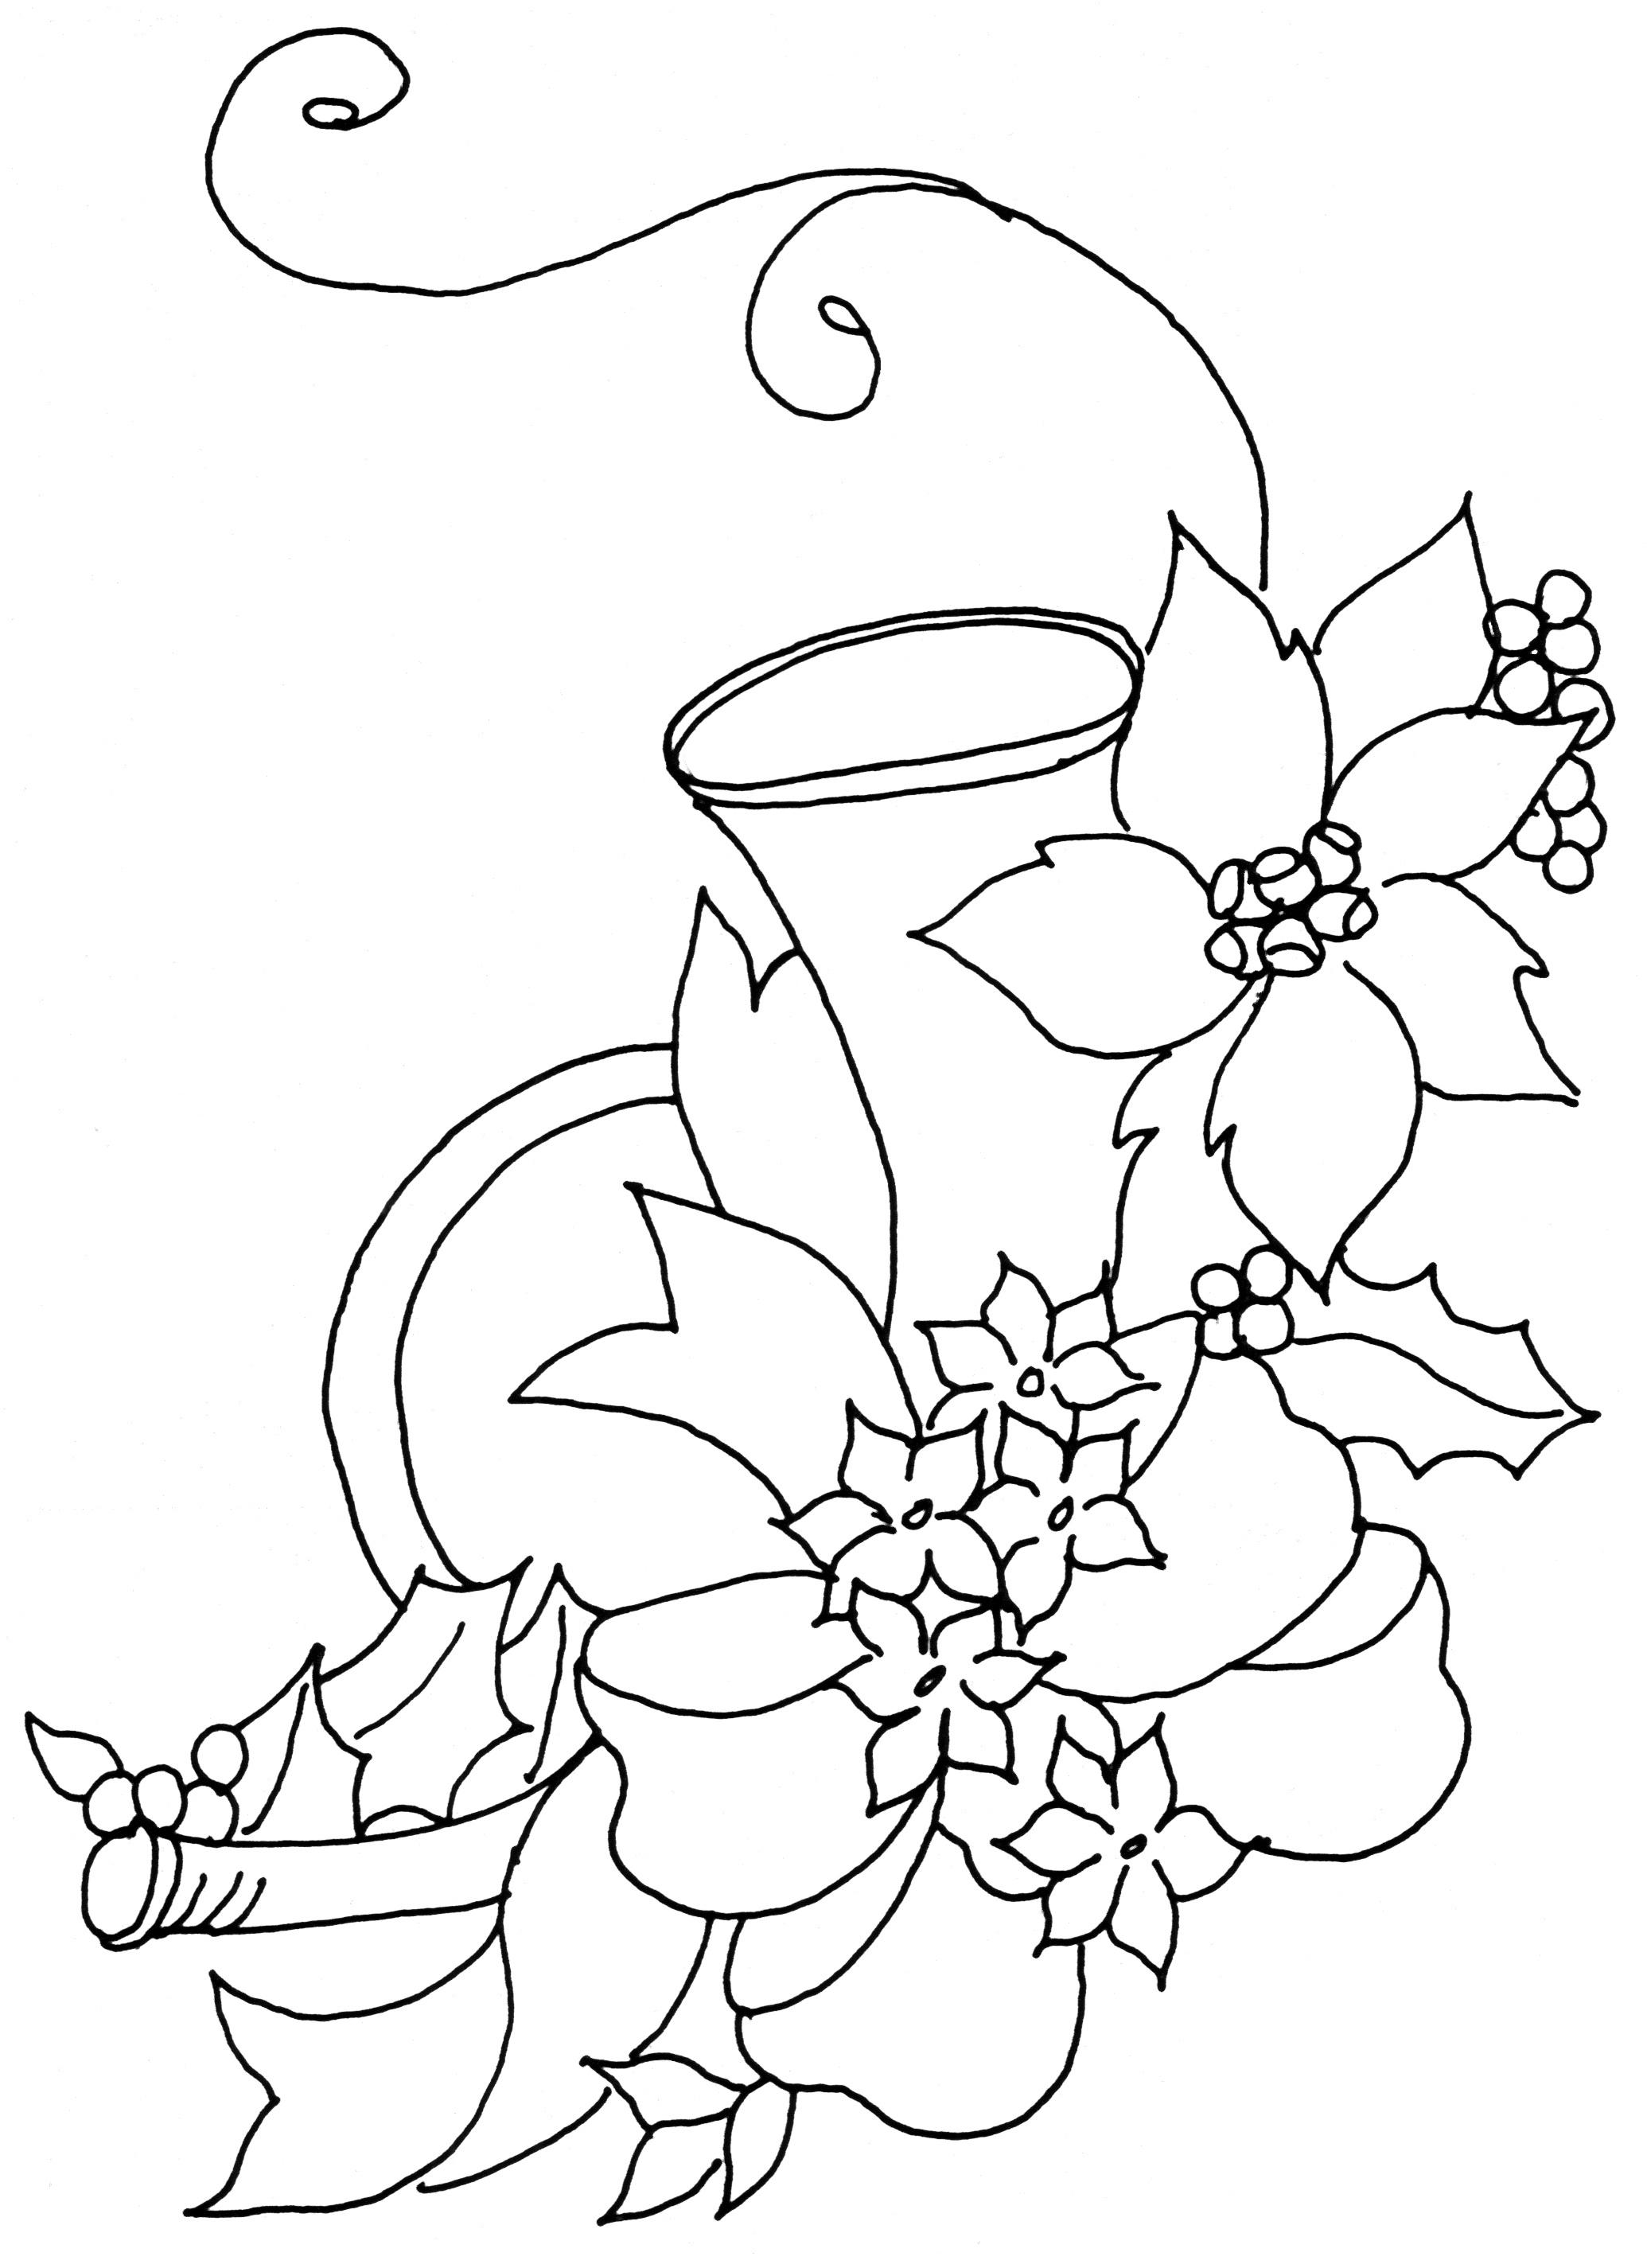 Dibujos Para Pintar Tela